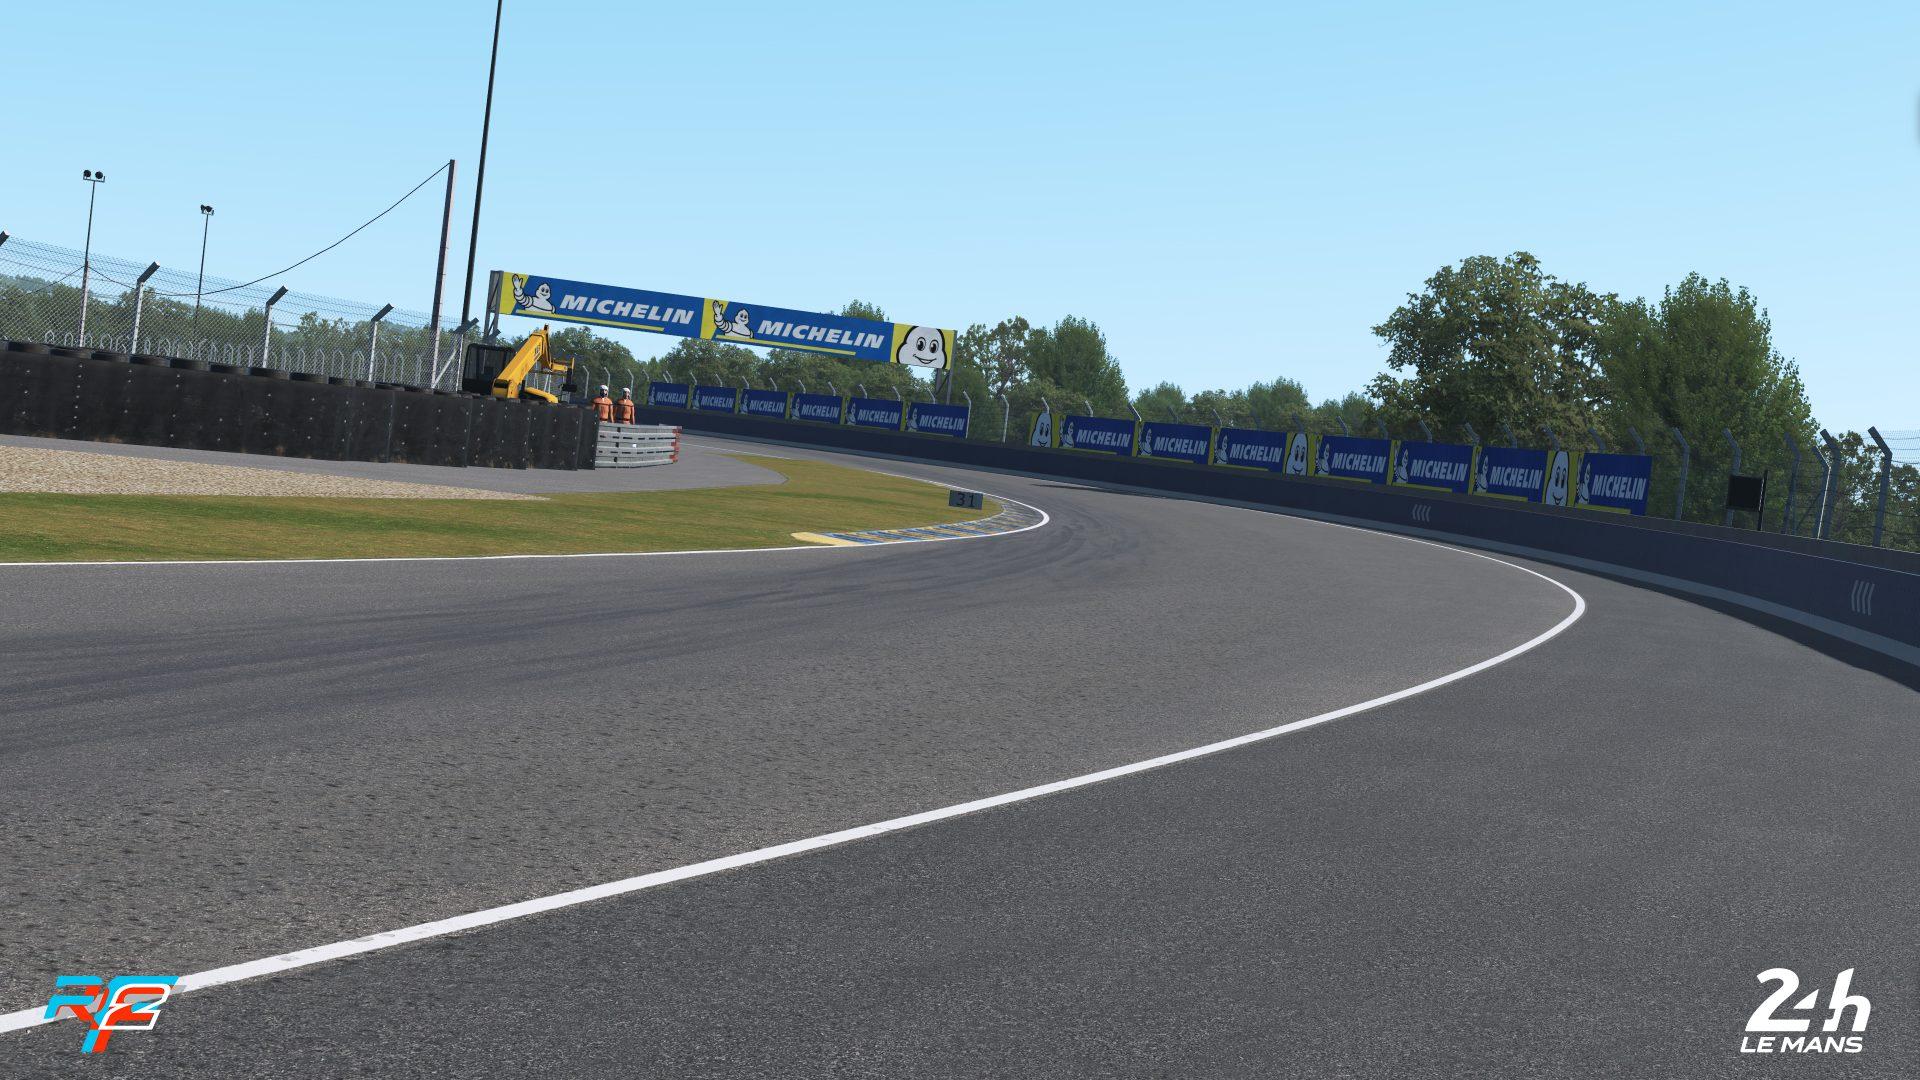 Le-Mans-track-guide-025-1920x1080.jpg